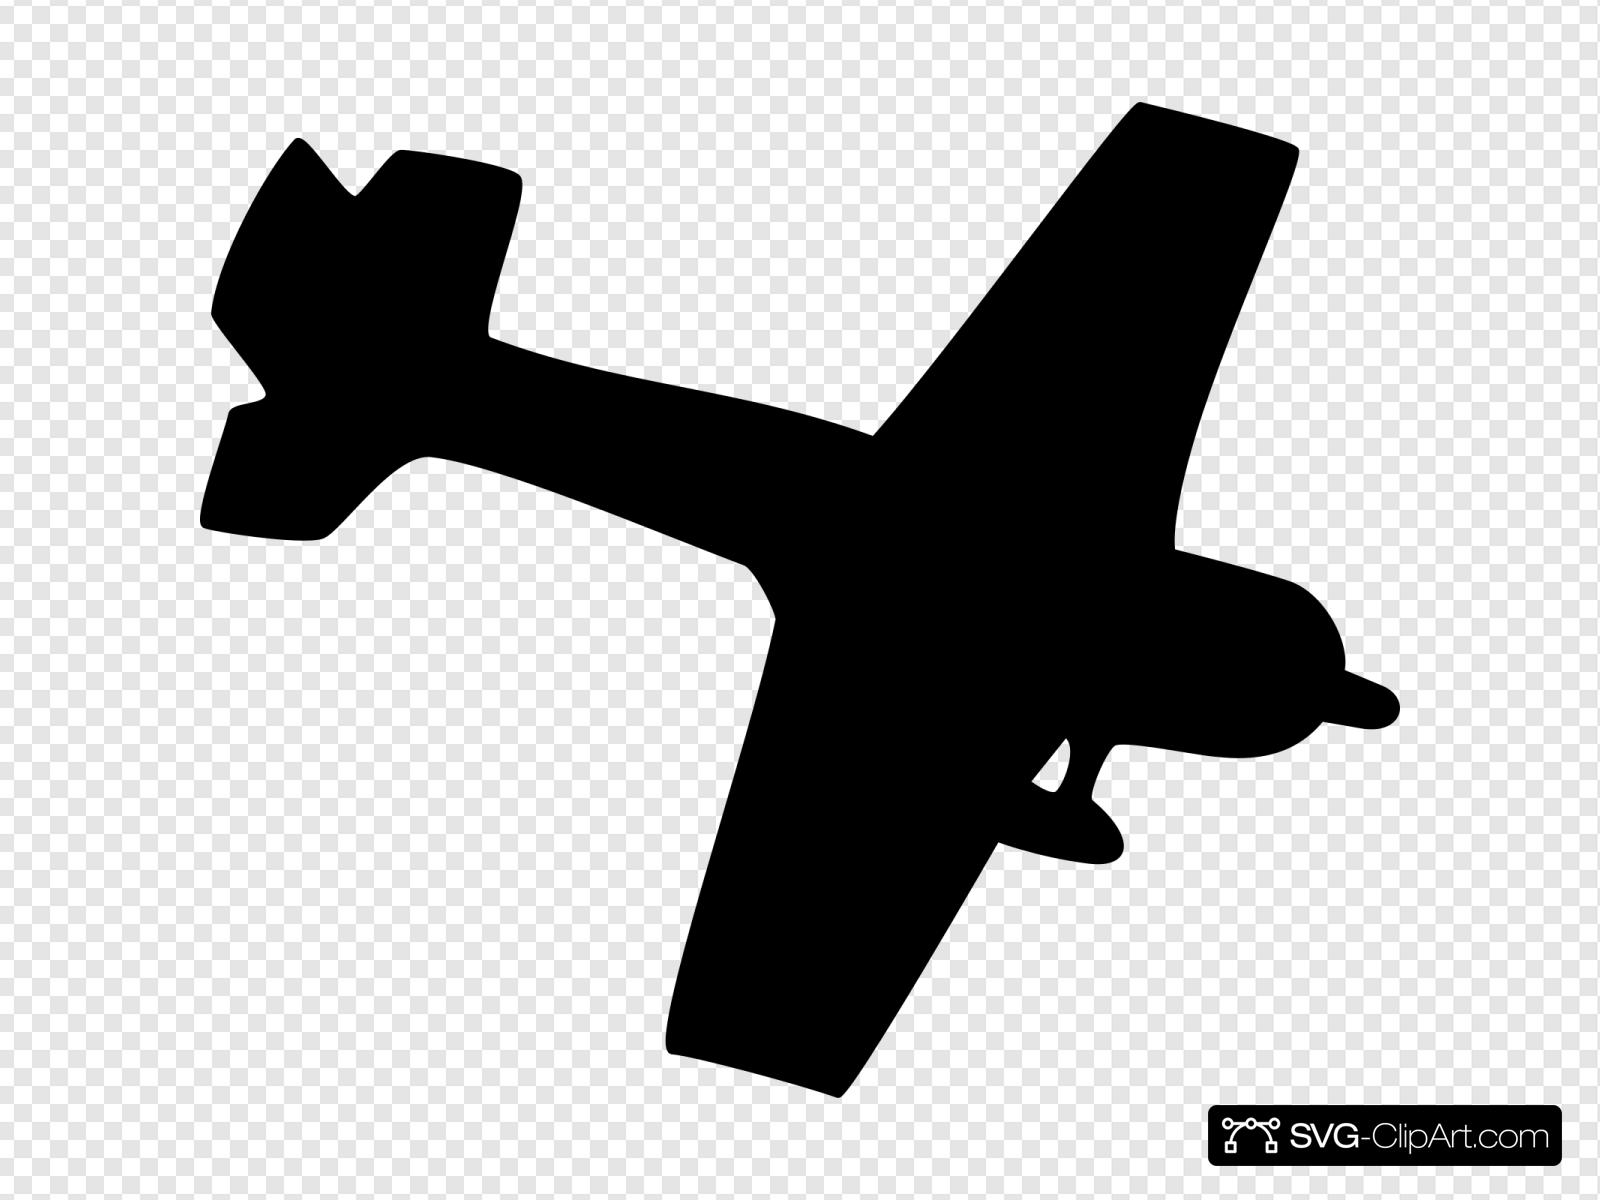 Silhouette Plane Svg Vector Silhouette Plane Clip Art Svg Clipart